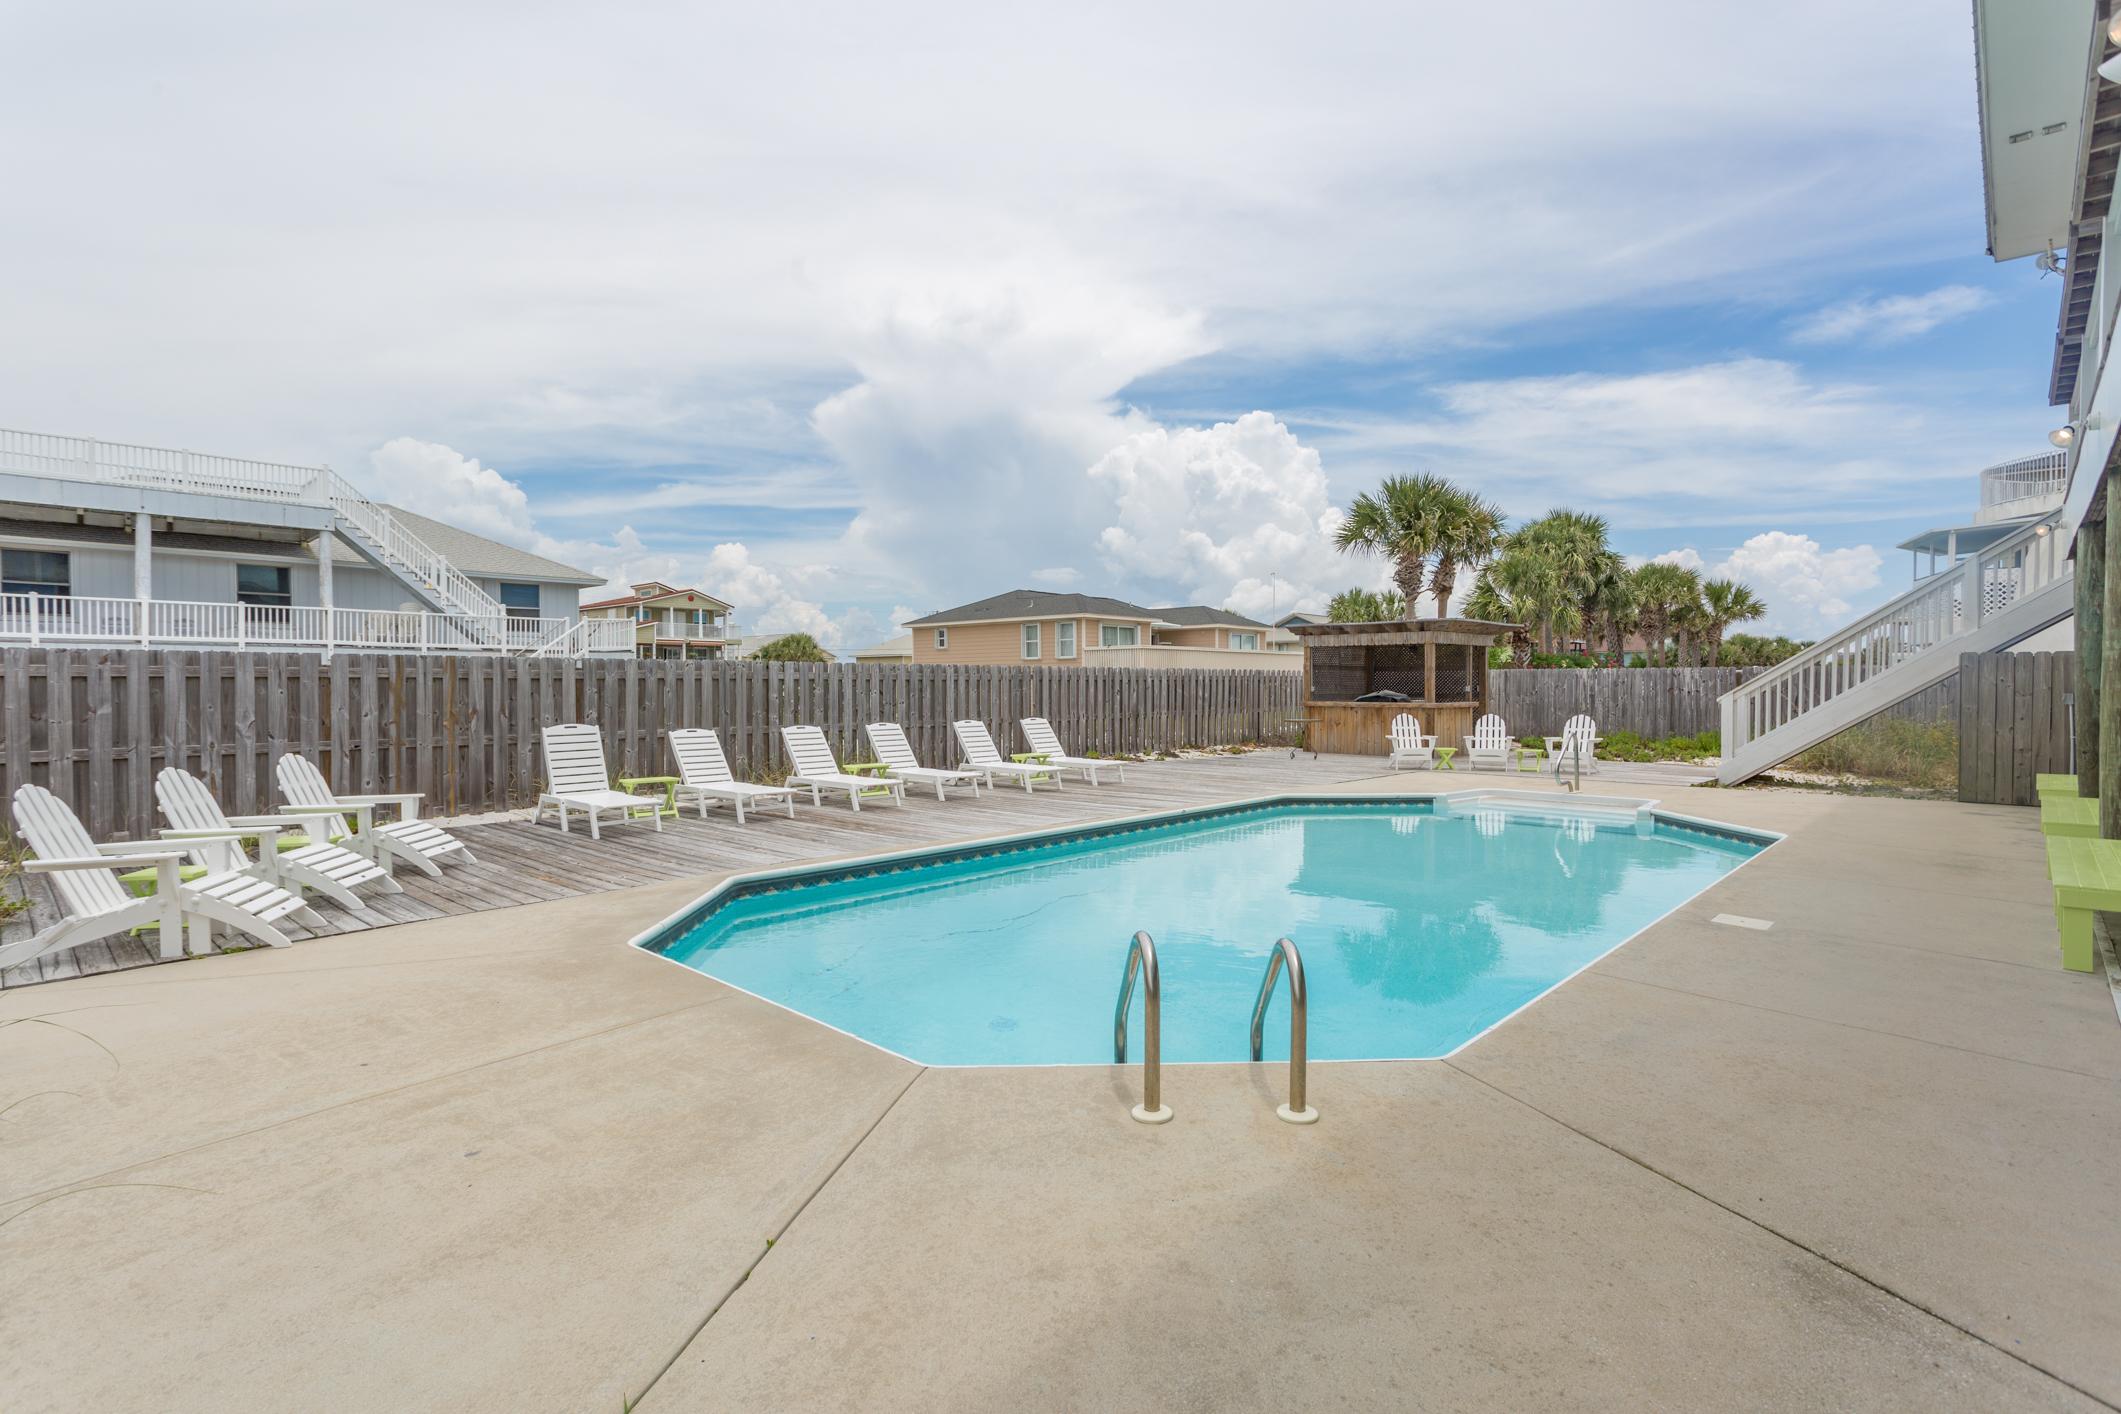 Ariola 1003 - The Starfish House House/Cottage rental in Pensacola Beach House Rentals in Pensacola Beach Florida - #64